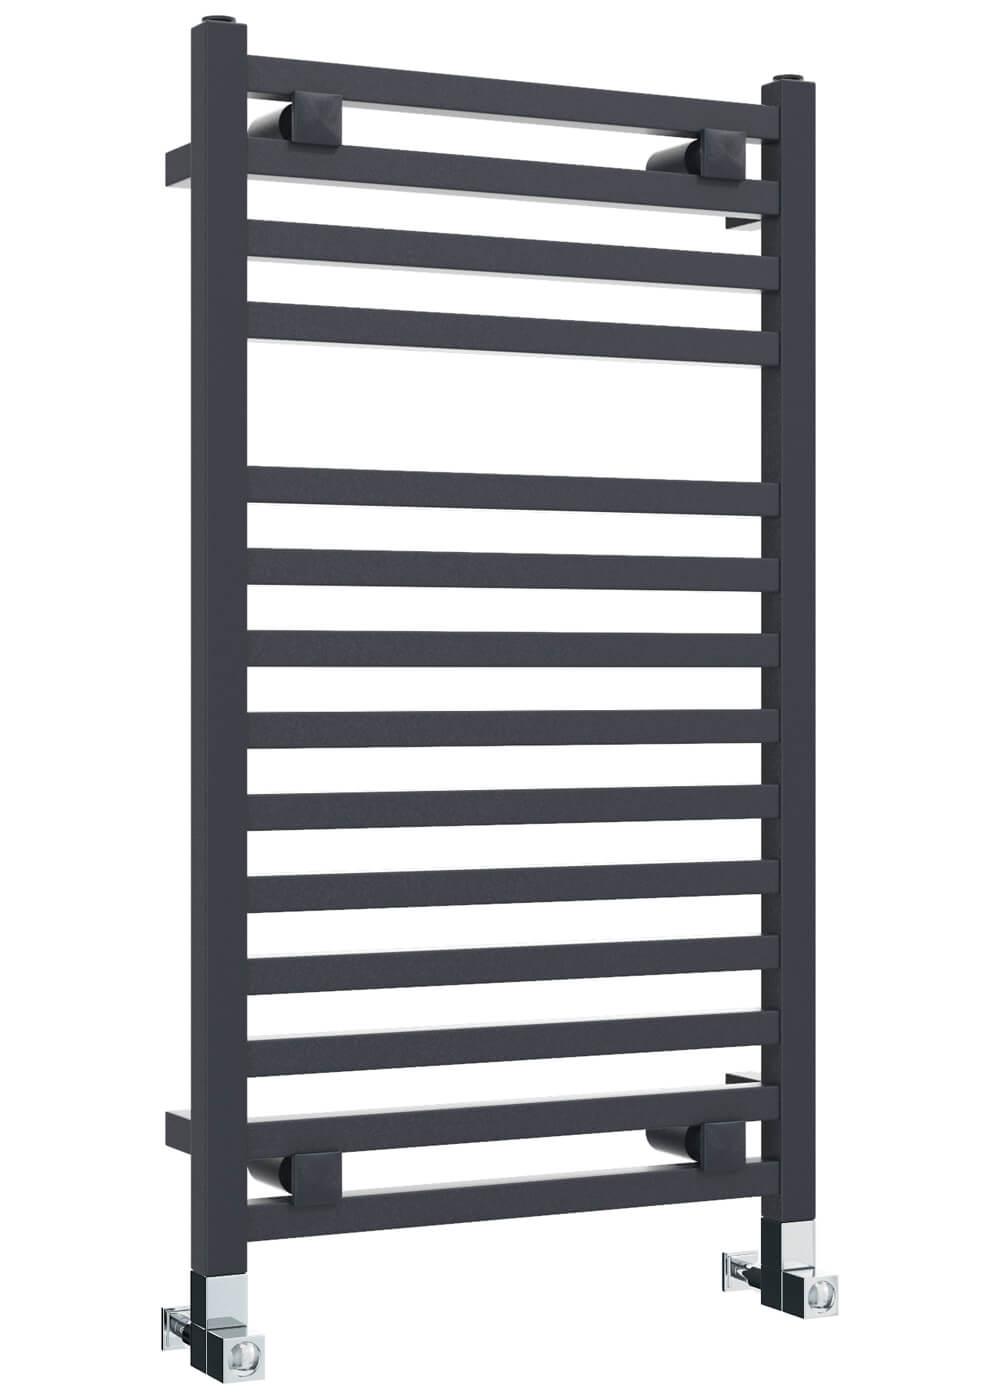 Vogue Squire 480mm Width Mildsteel Straight Towel Rail